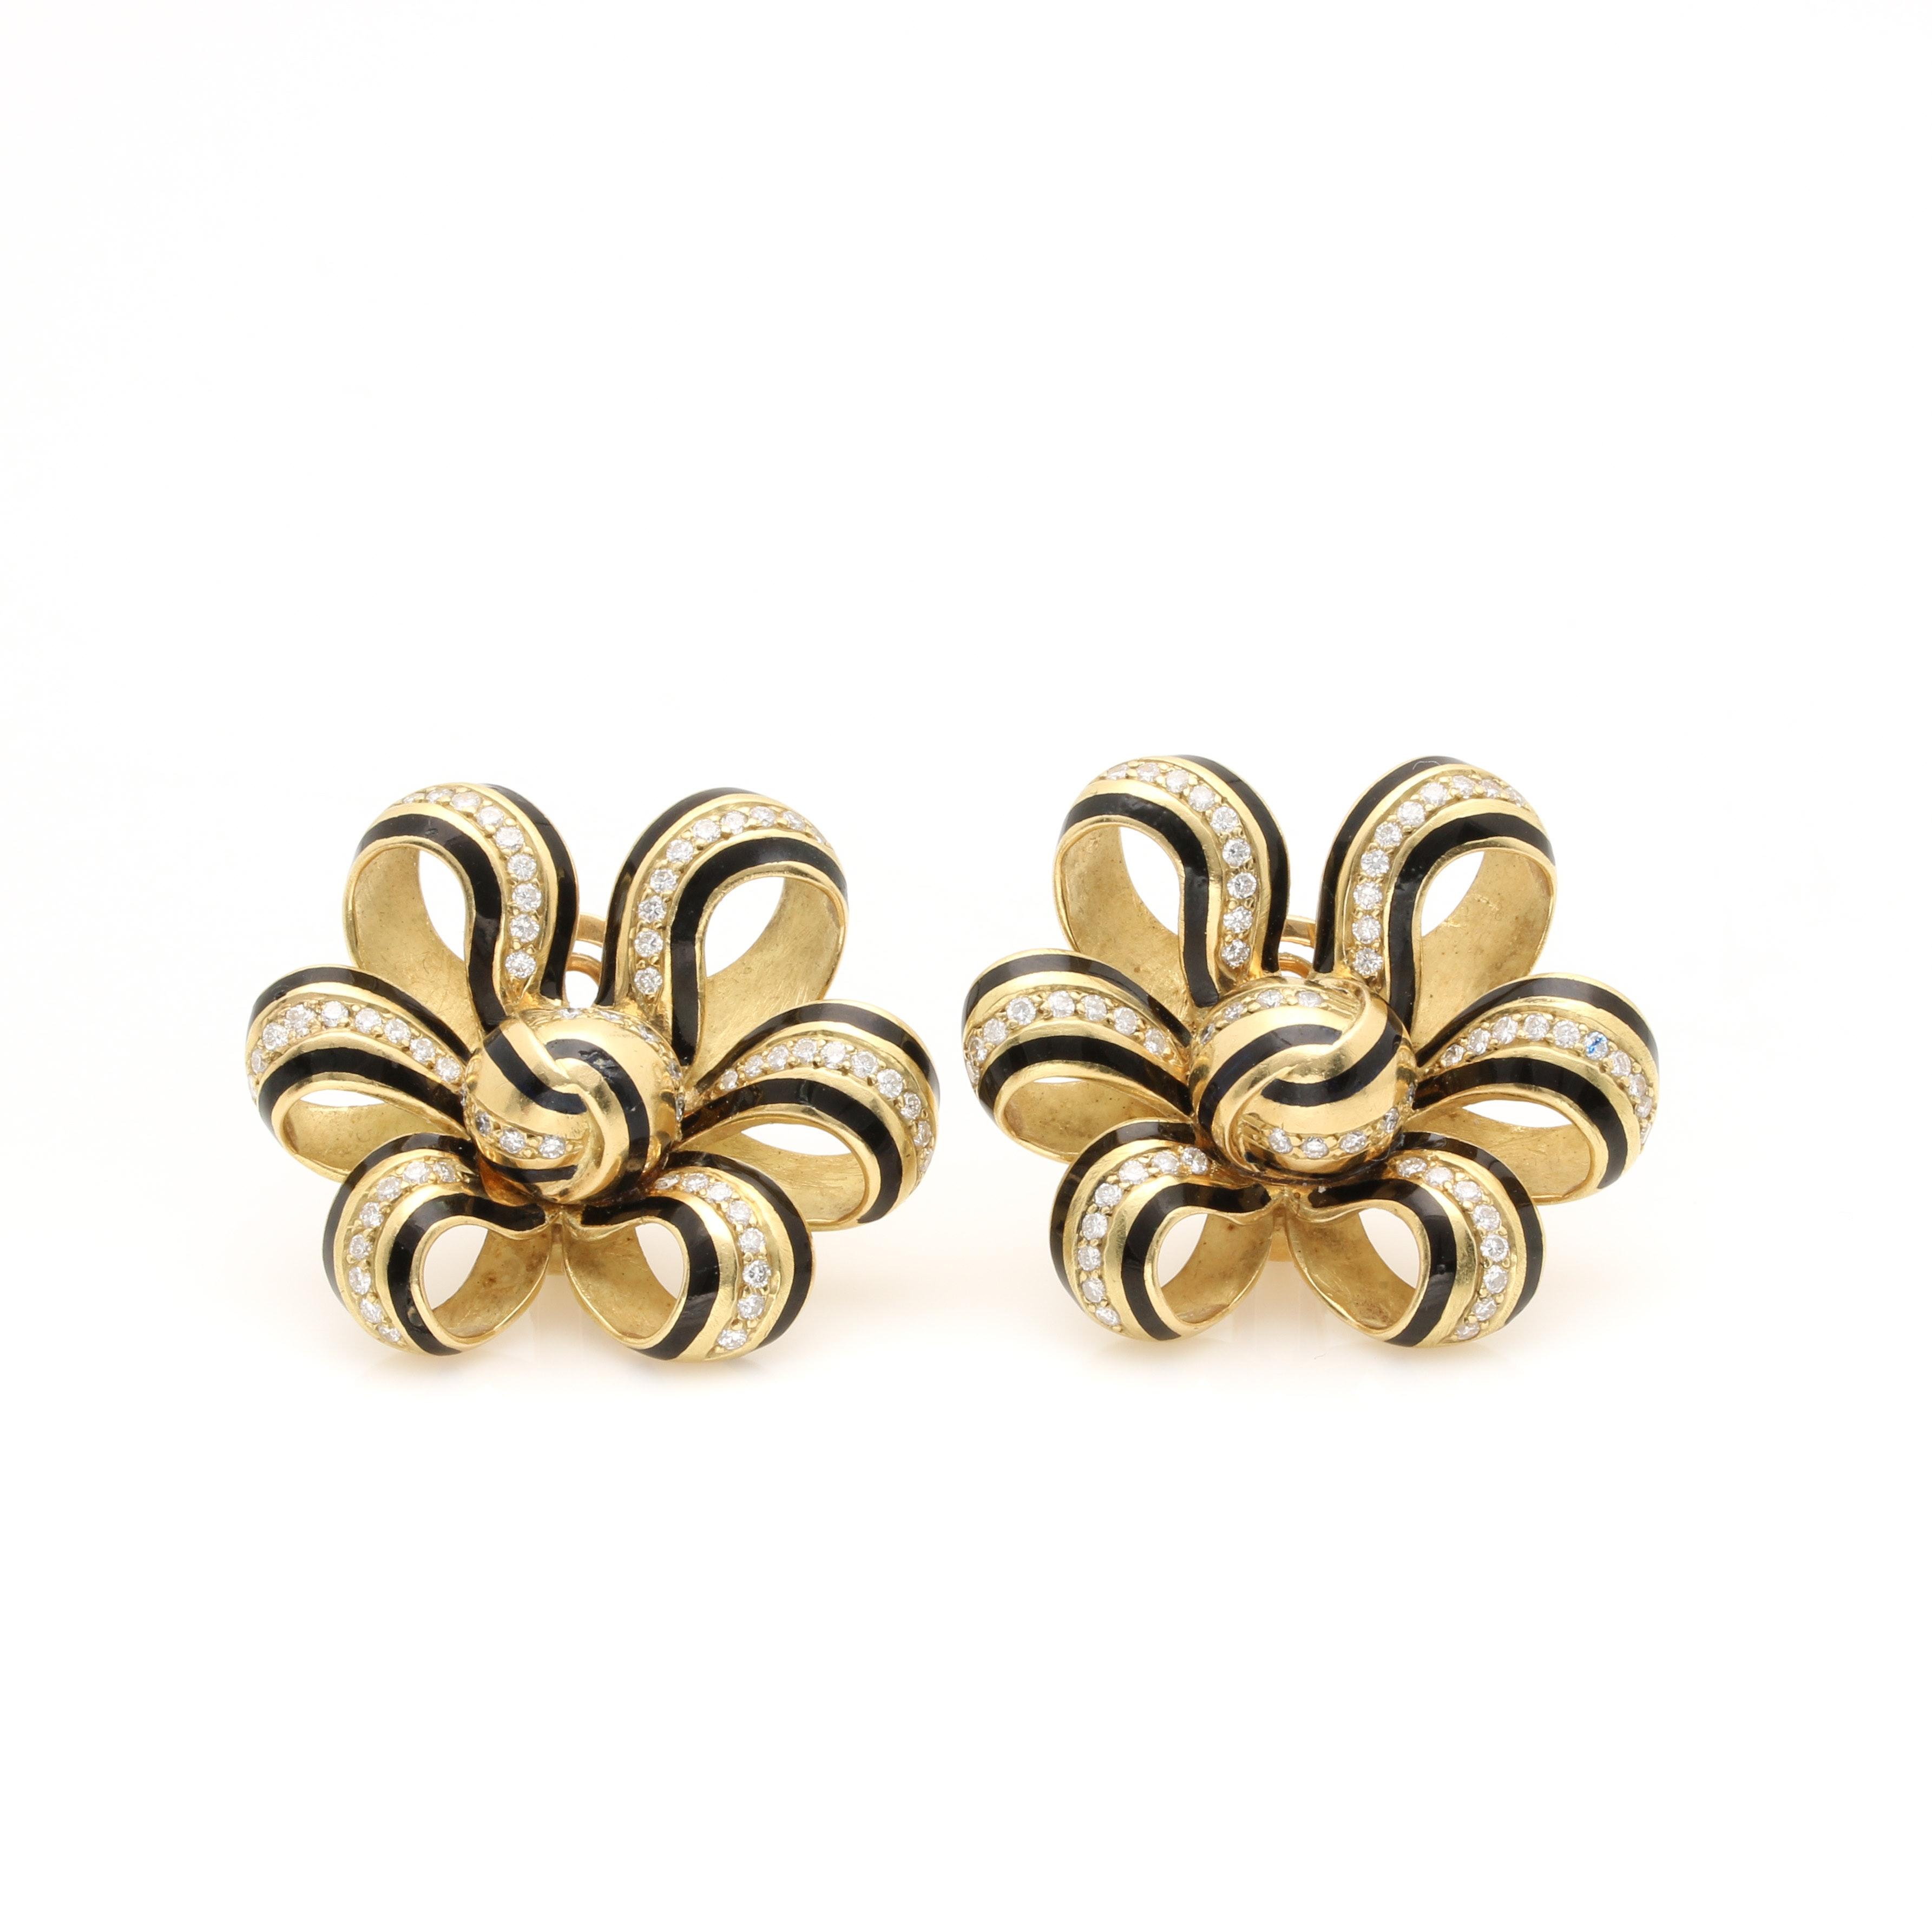 18K Yellow Gold Black Enameled 1.89 CTW Diamond Bow Clip On Earrings